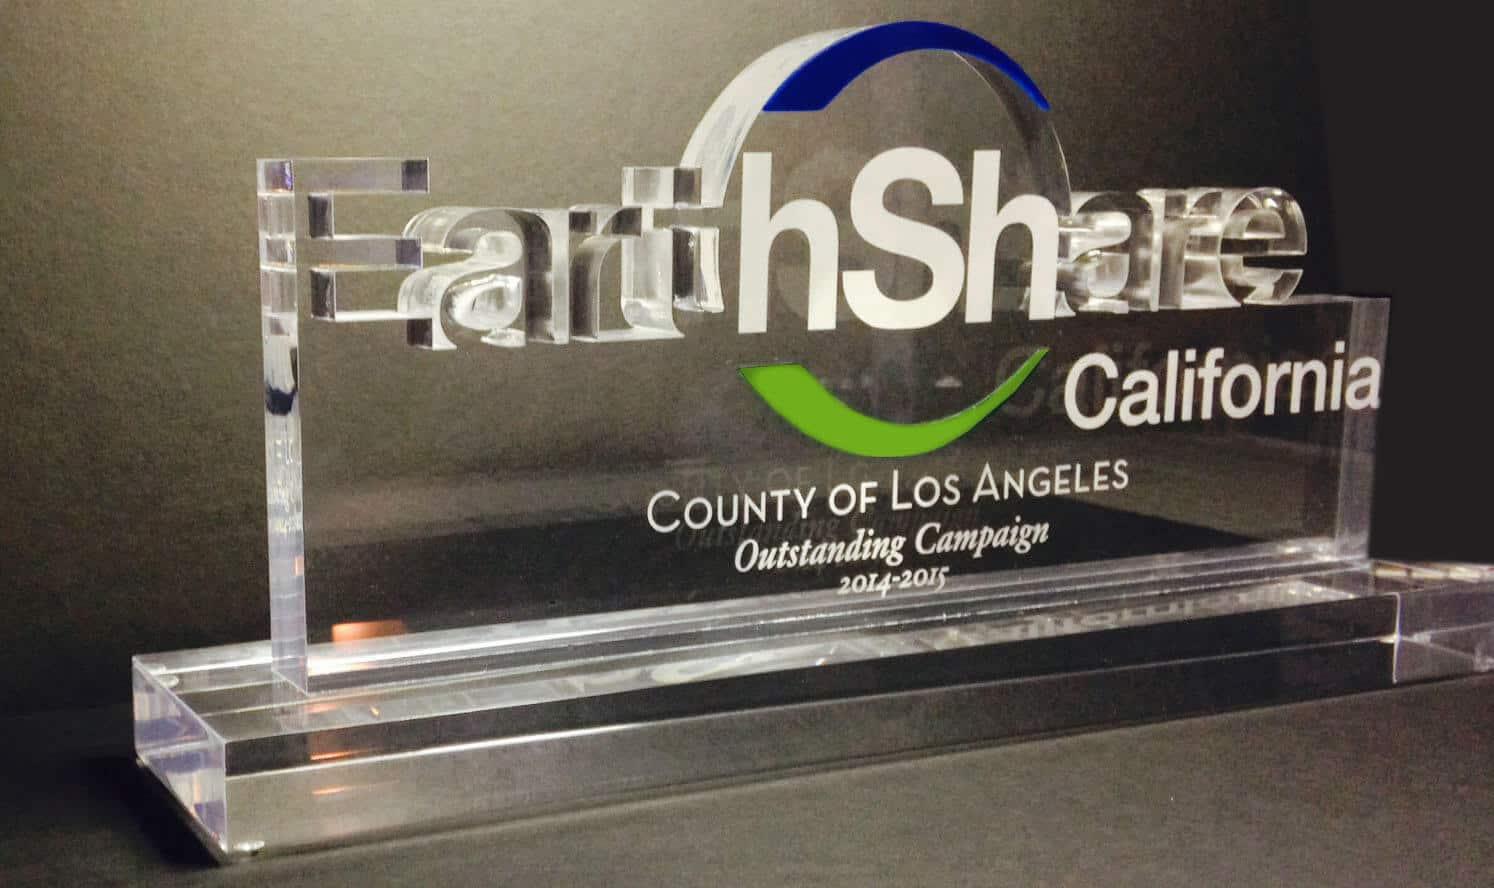 Photo of Earthshare Acrylic Award by DIG53